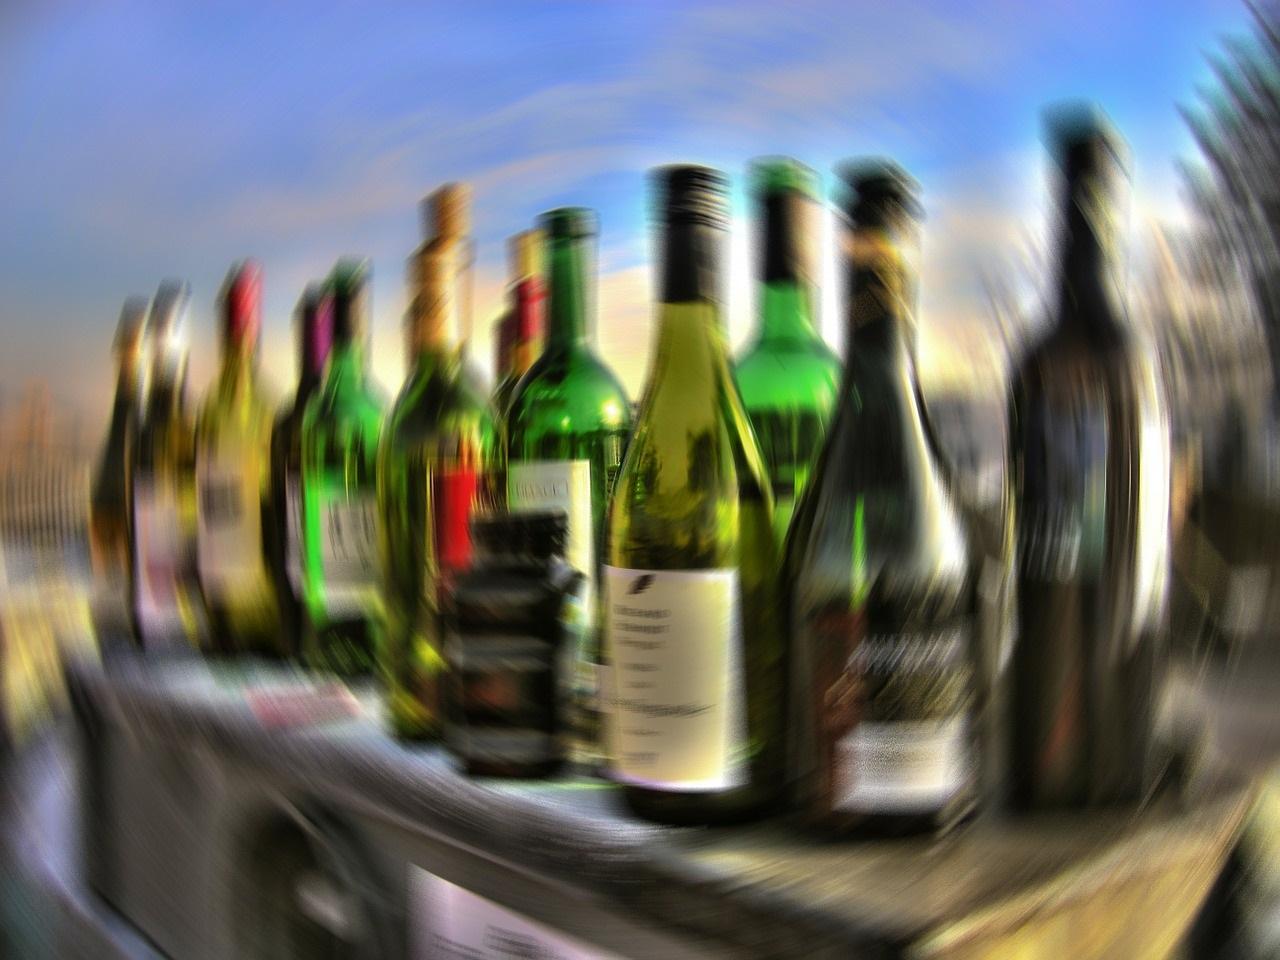 Rechtsanwältin Heike Michaelis Alkohol im Straßenverkehr